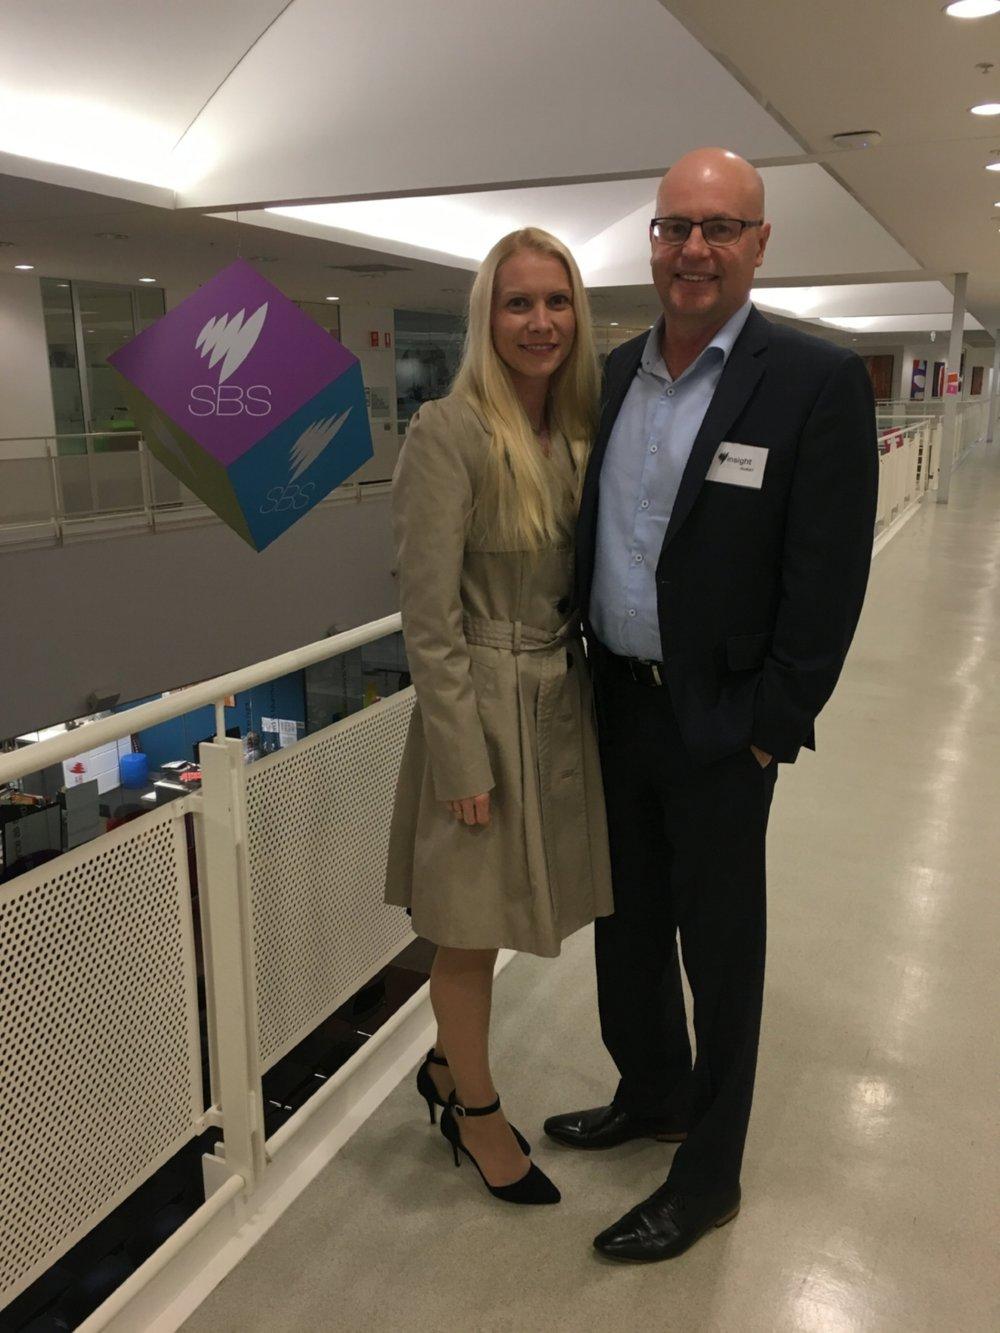 Julie and Darryl visiting SBS Aug 2018